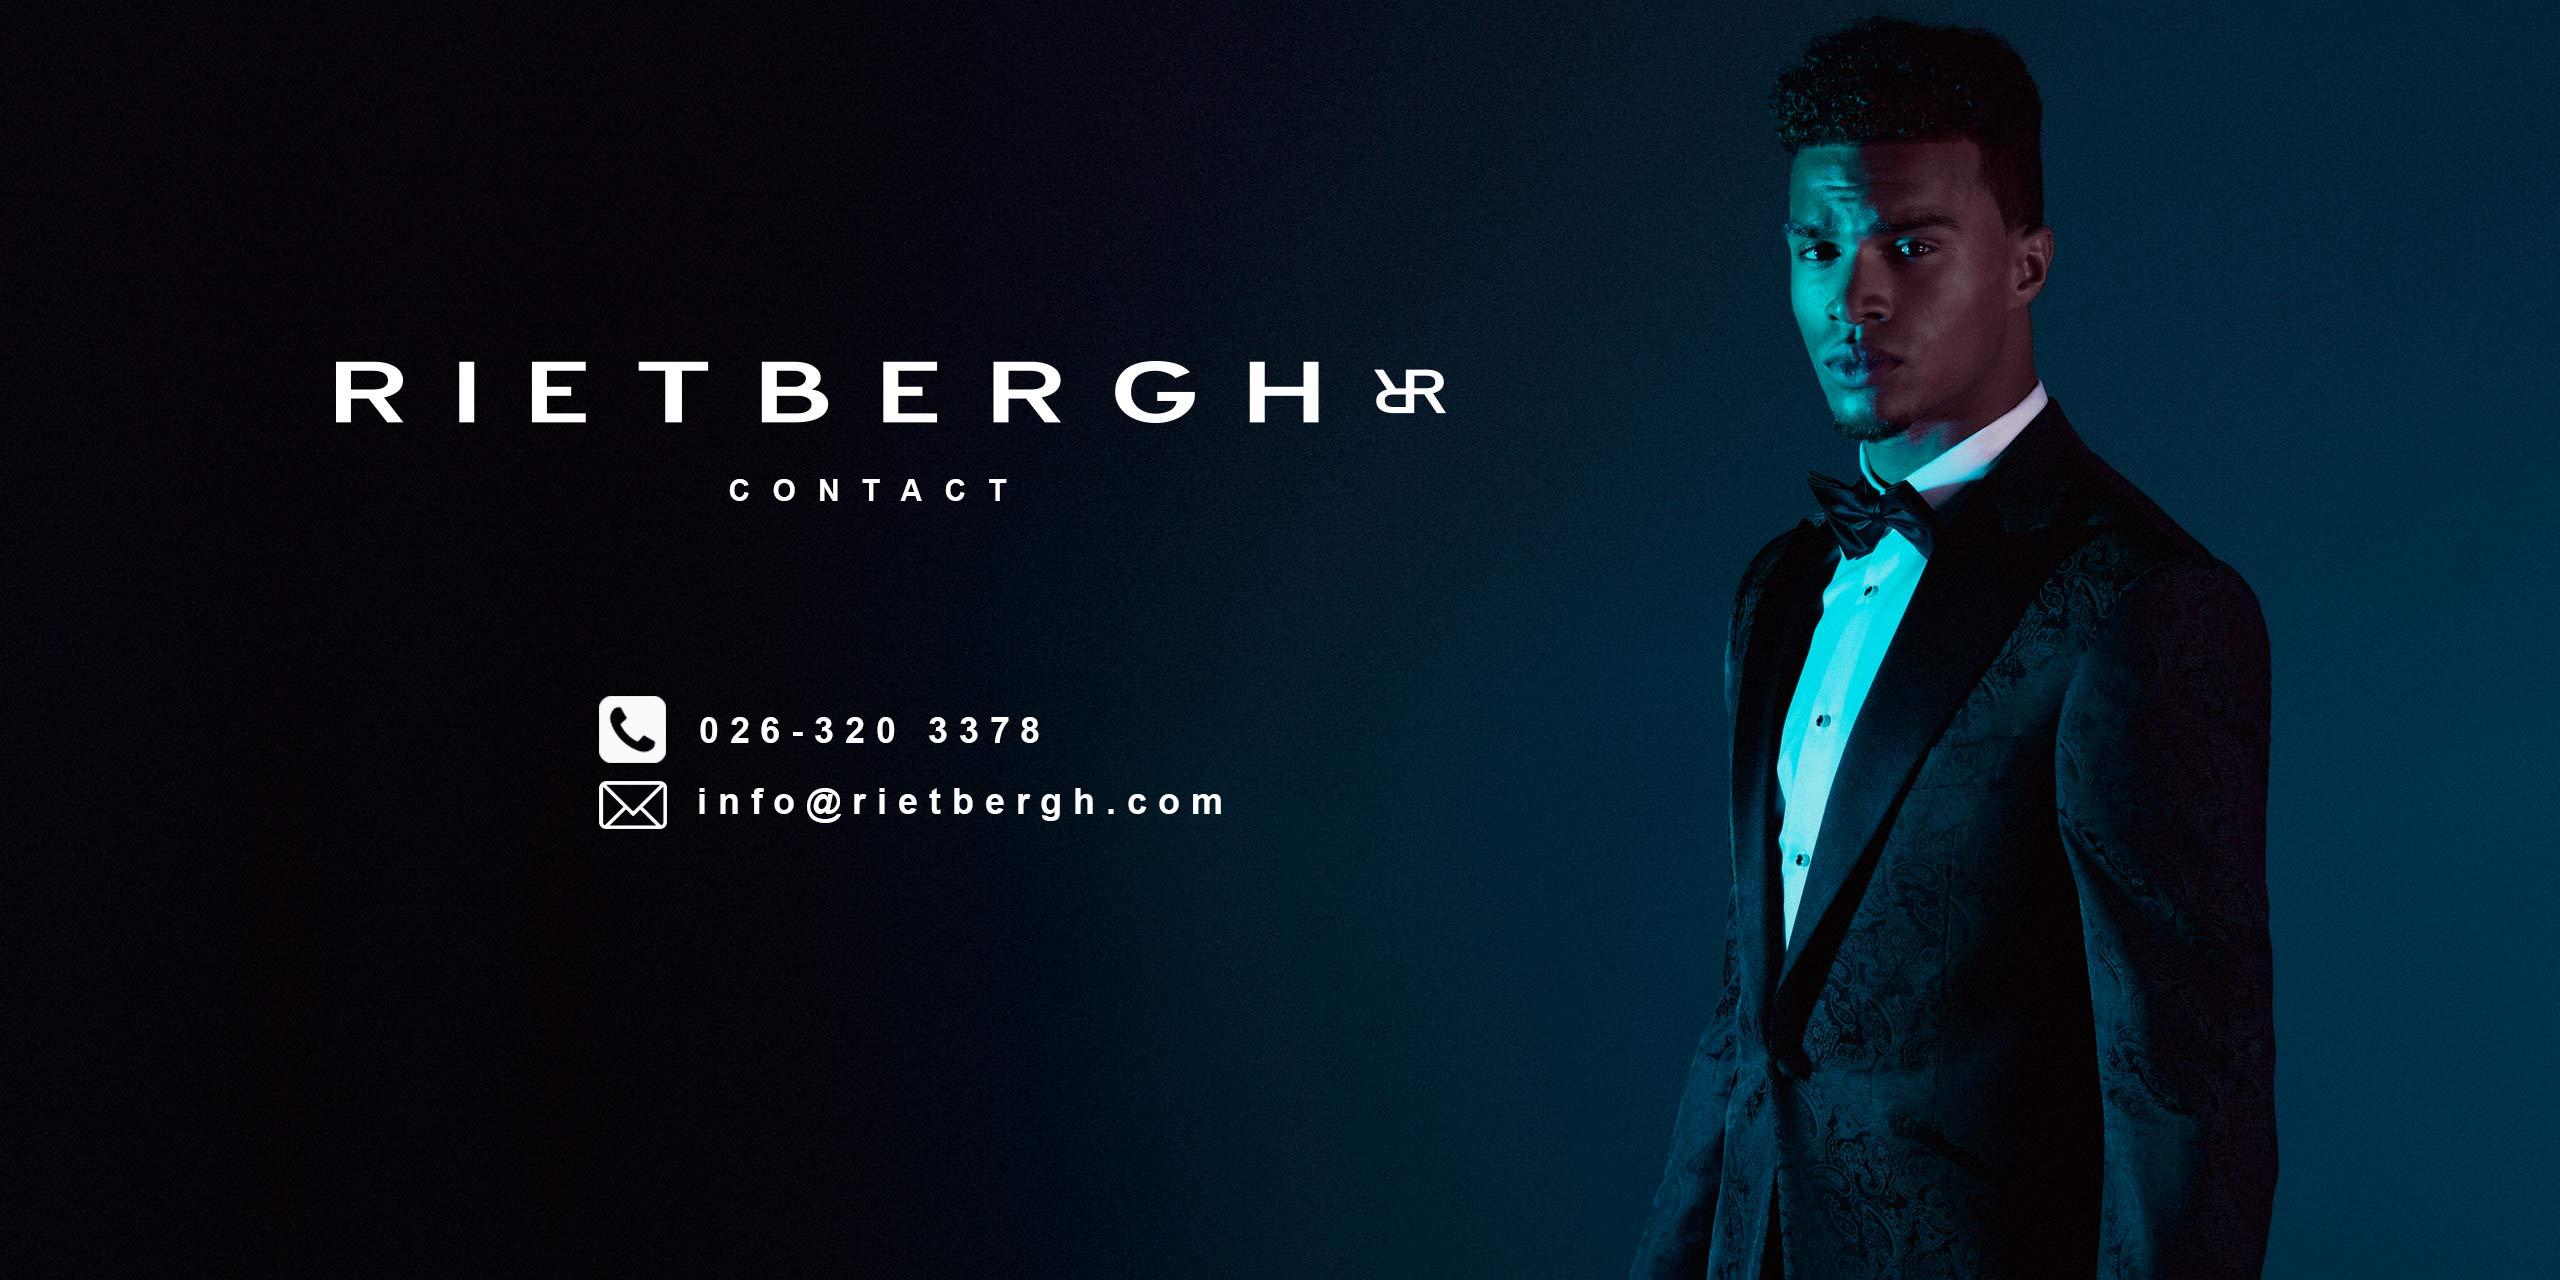 contact Rietbergh